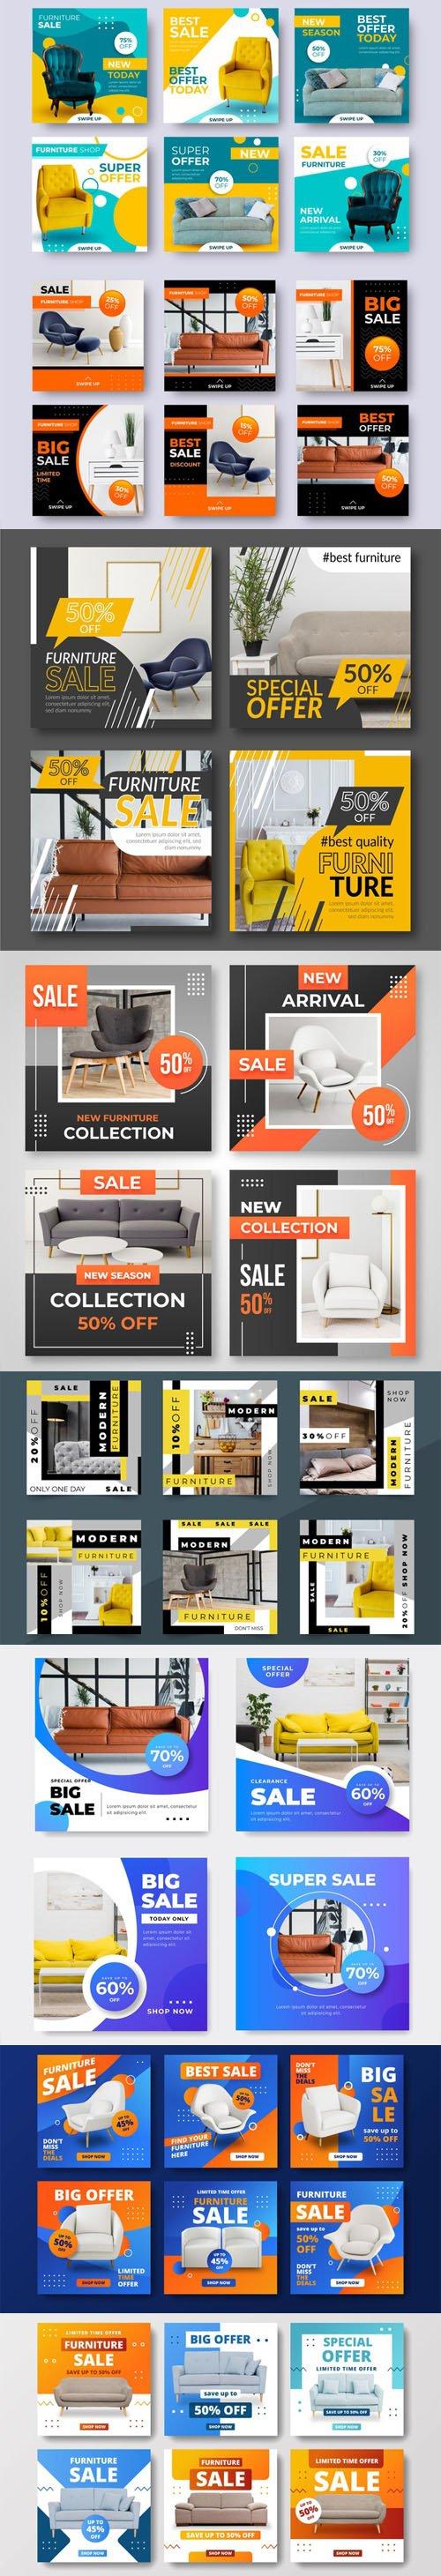 Furniture Sale Instagram Posts Vector Collection